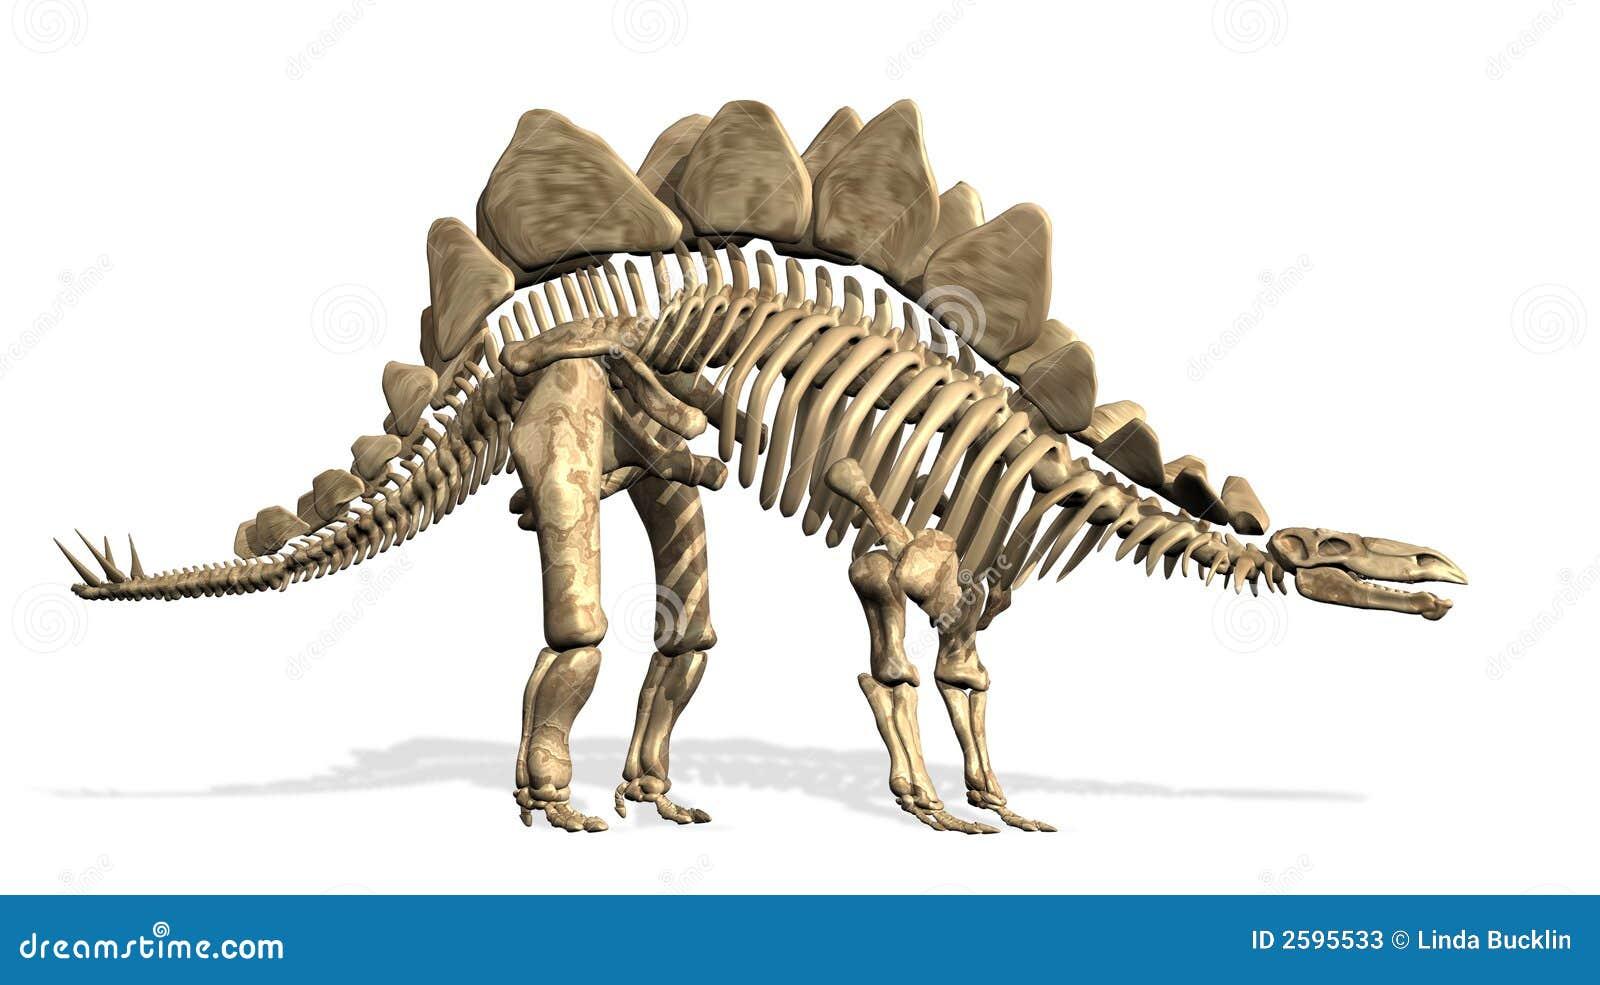 3D render of a stegosaurus skeleton, isloated on white.